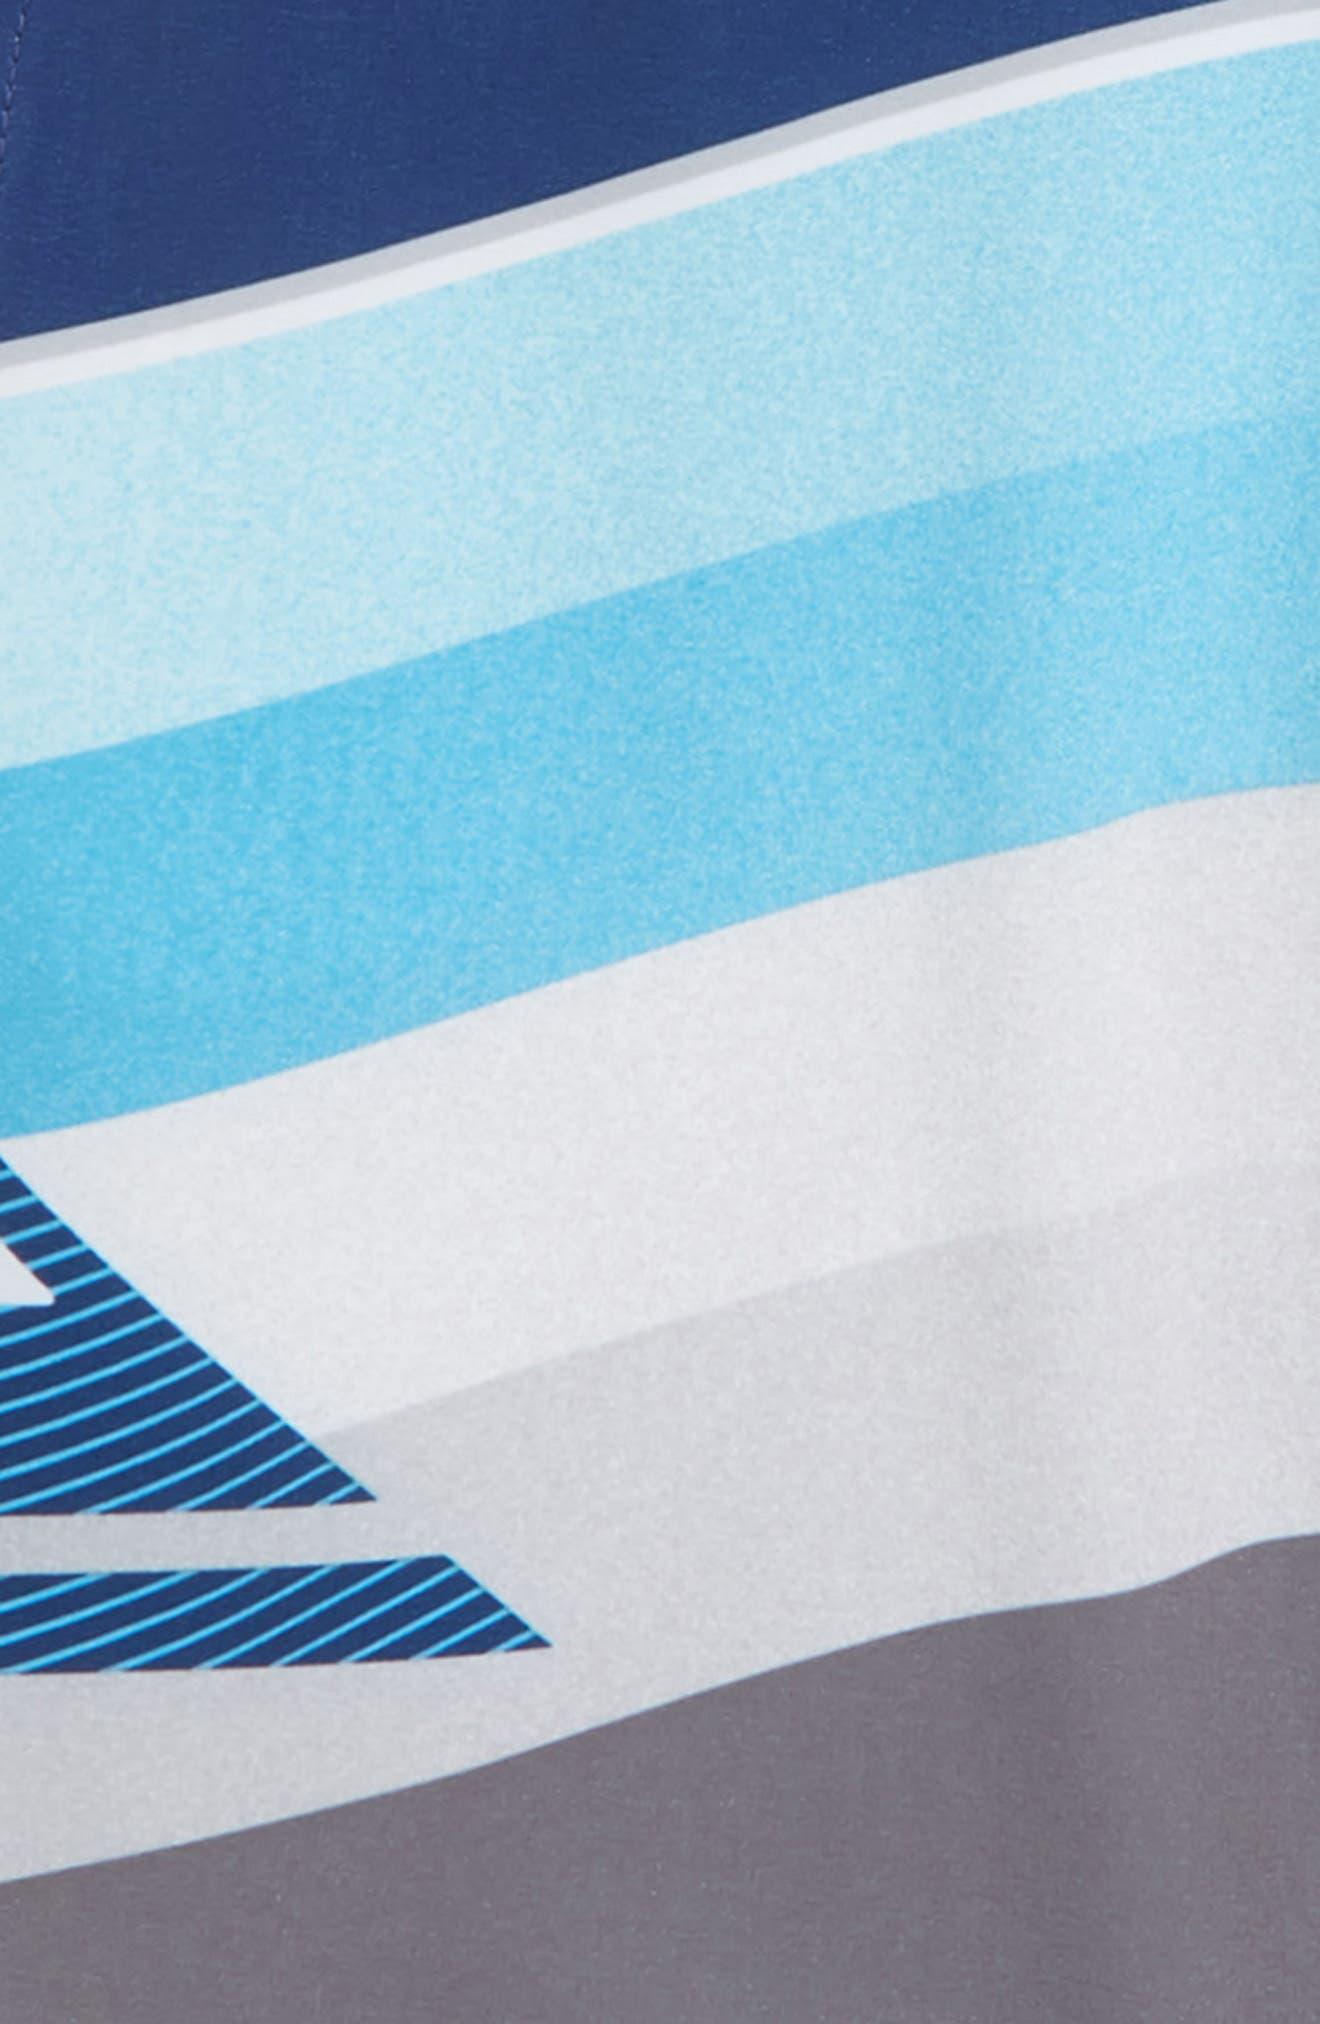 Highline Slab Board Shorts,                             Alternate thumbnail 2, color,                             401